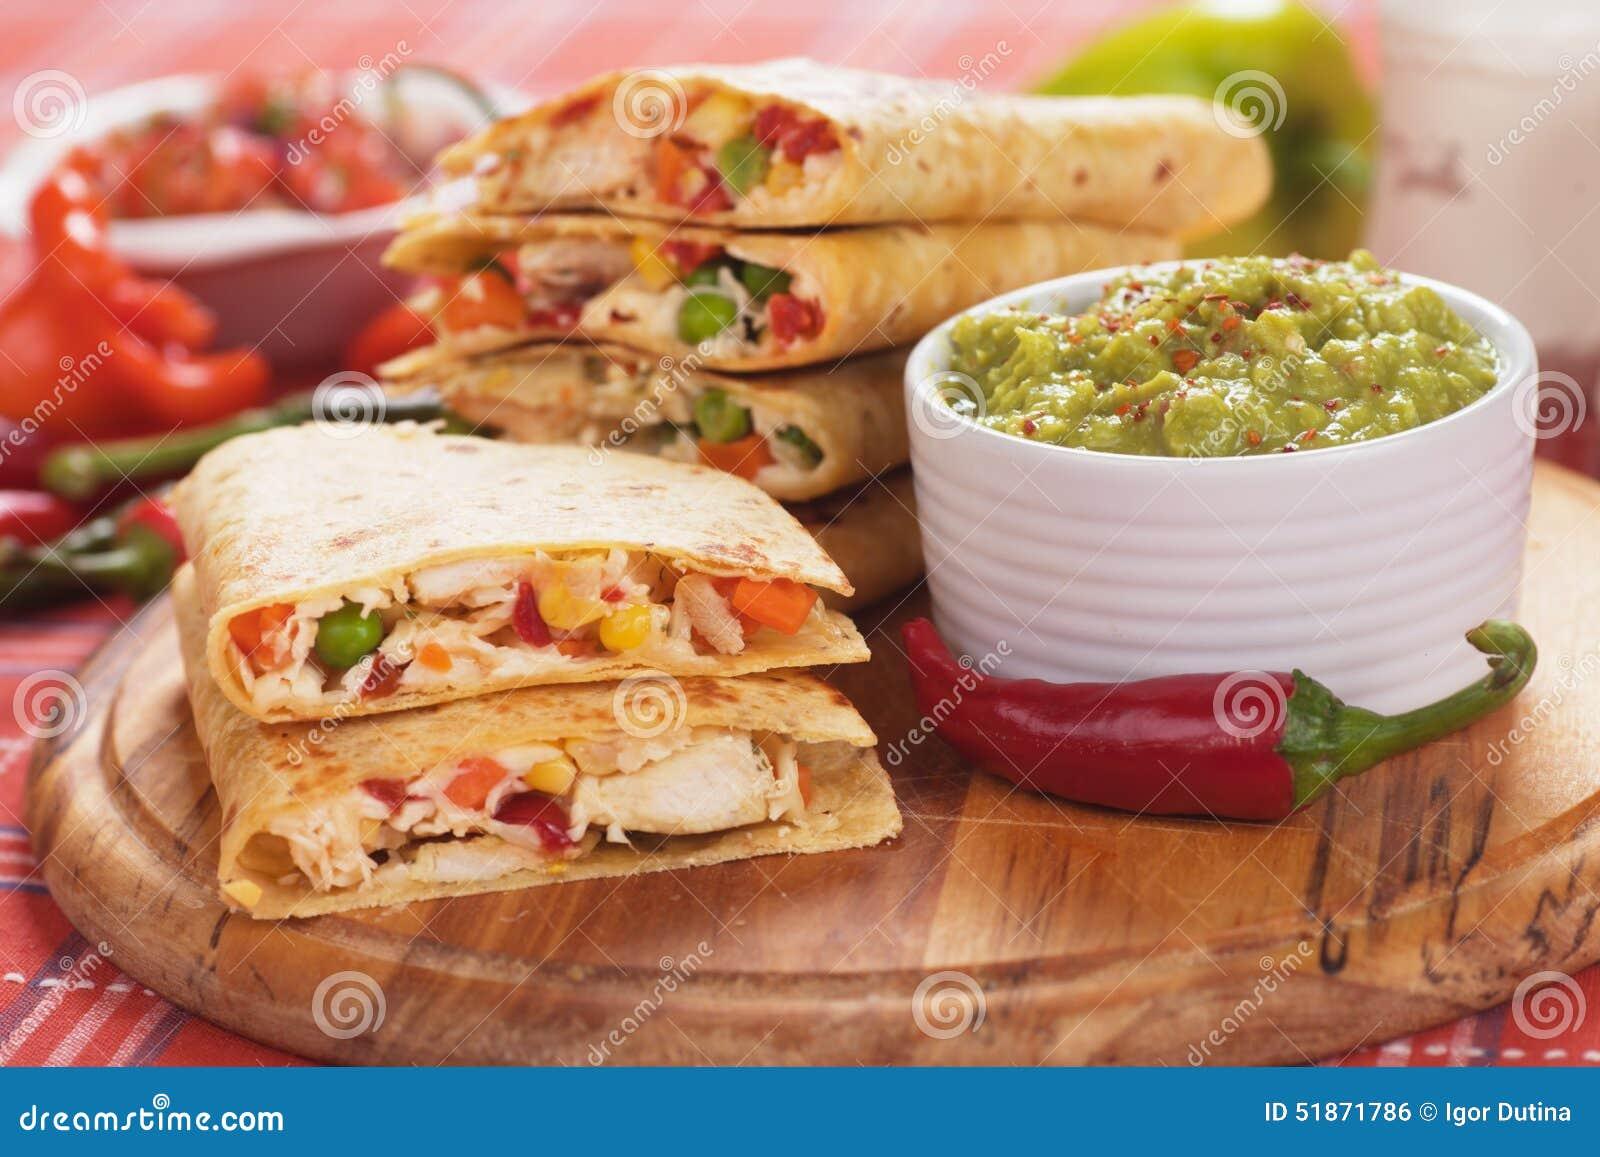 Quesadillas With Guacamole Dip Stock Photo - Image: 51871786